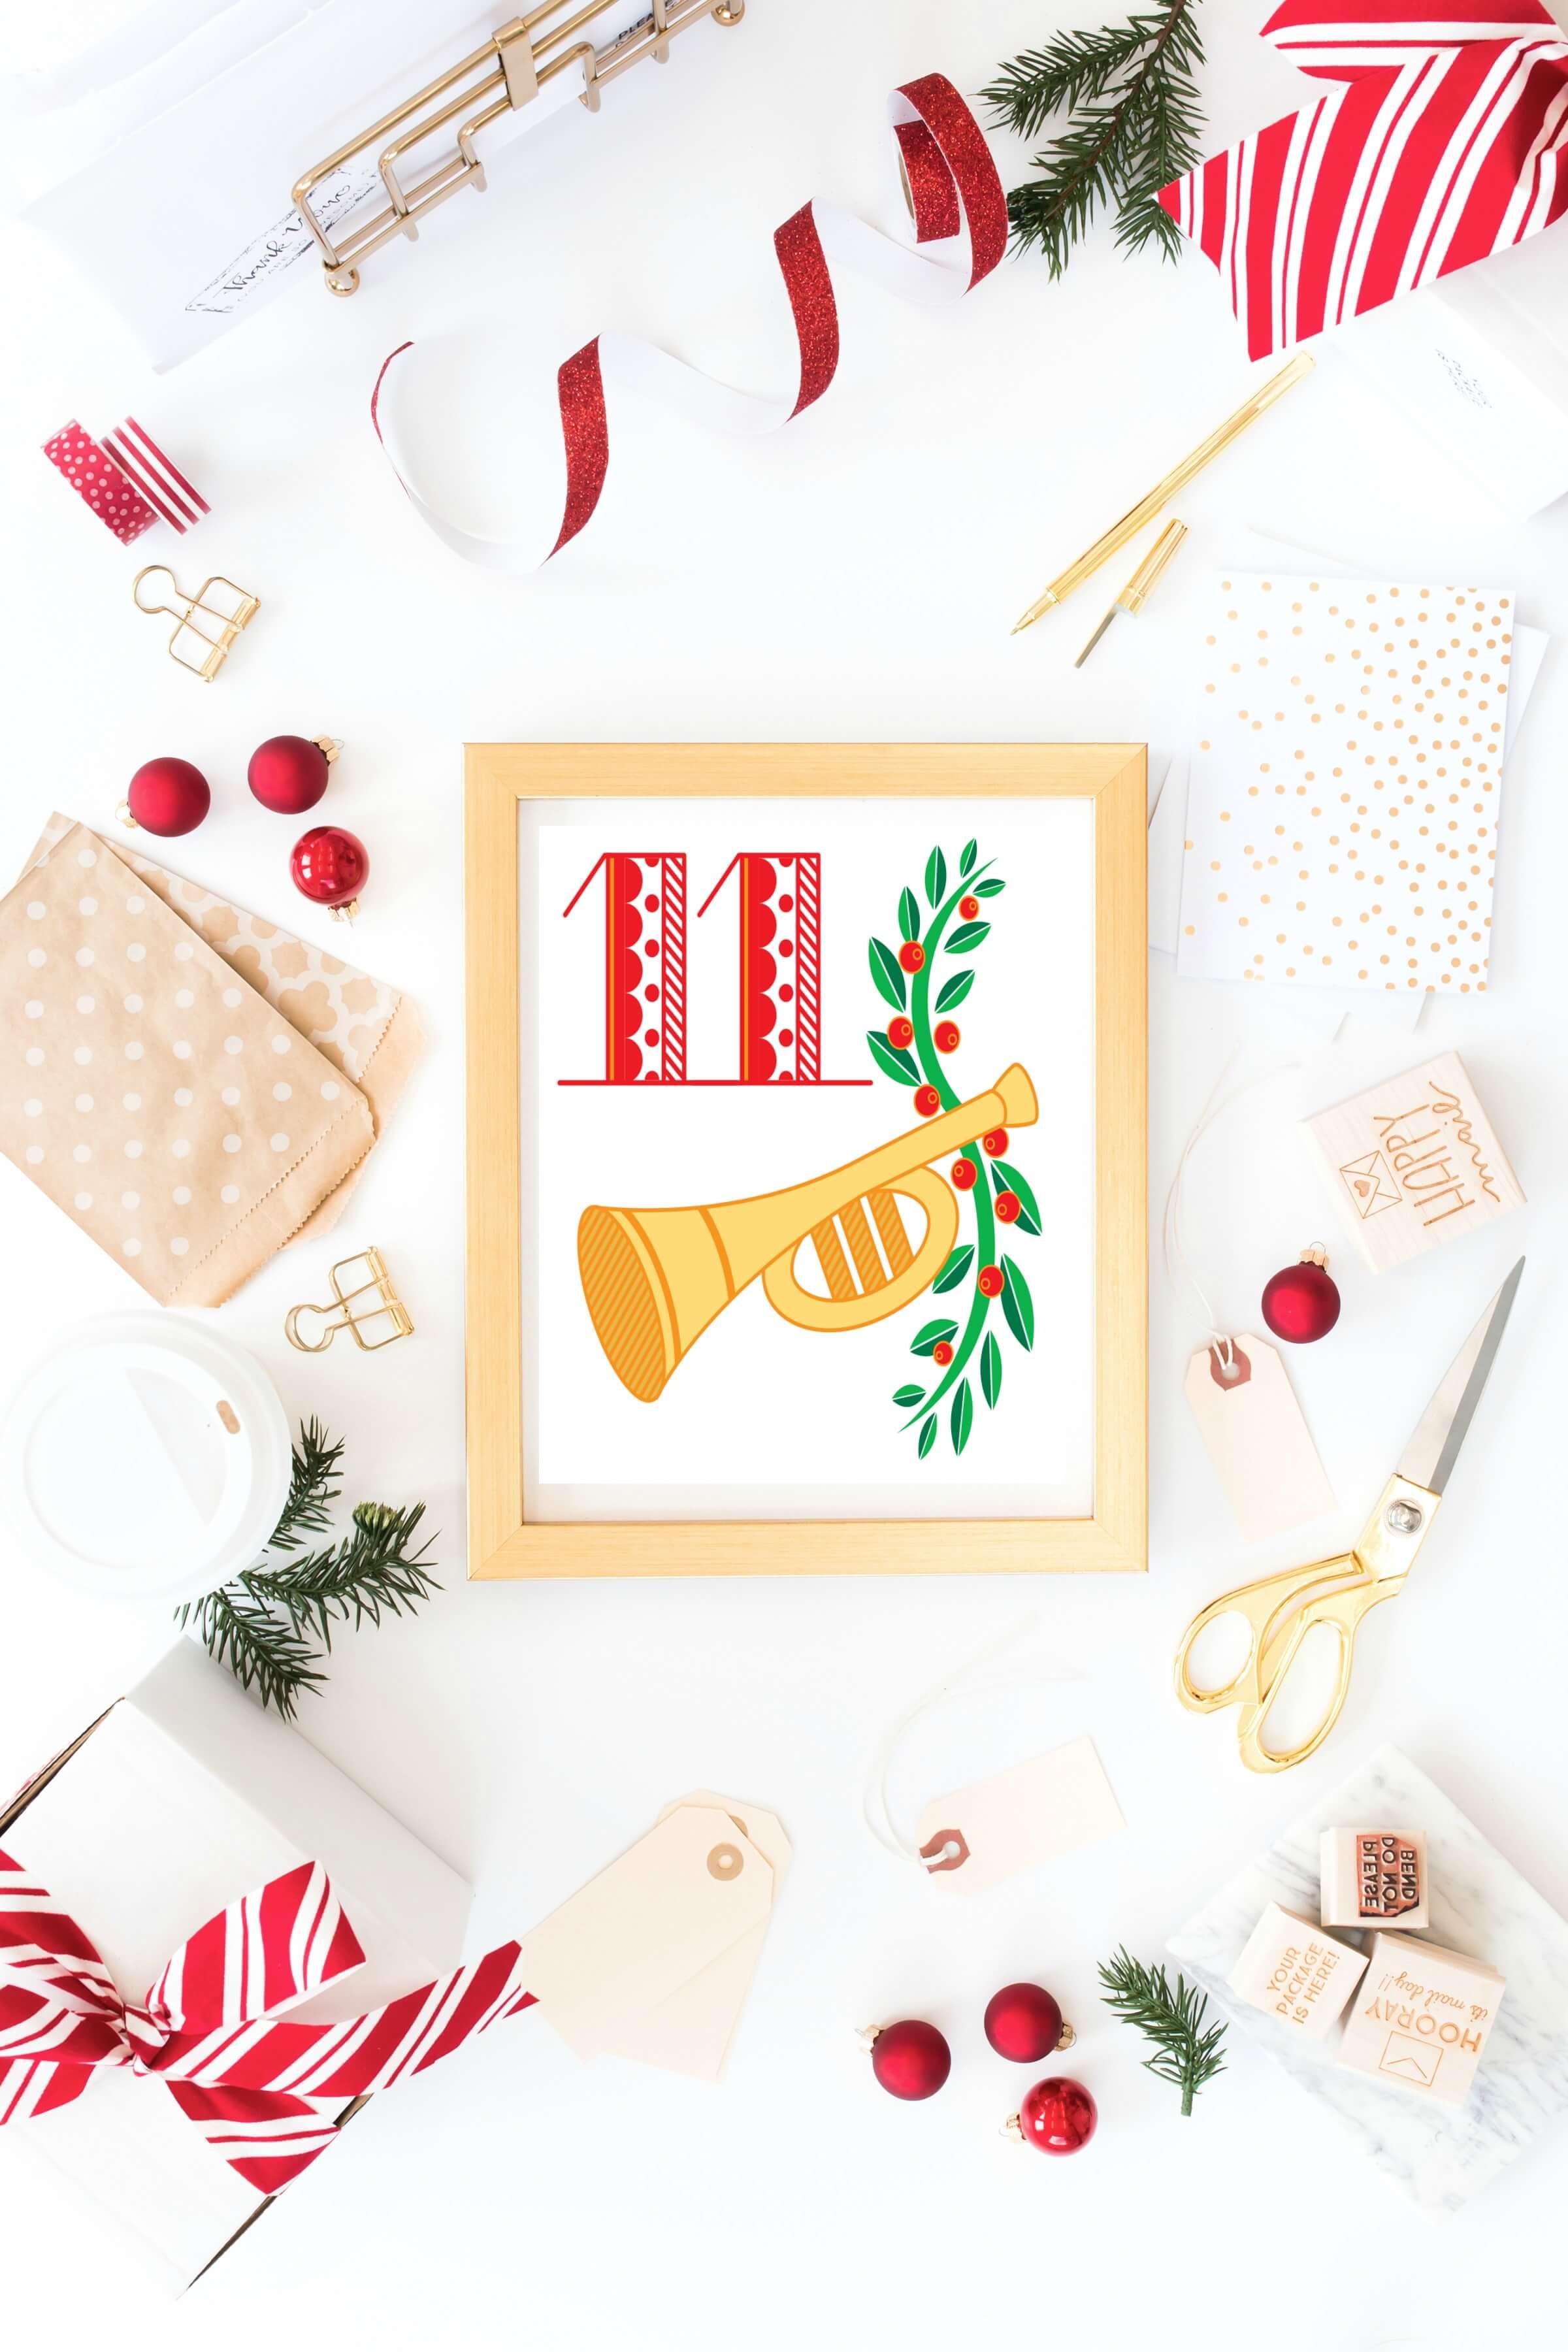 photo regarding Printable Christmas Art named 12 Times of Xmas Printables: Absolutely free Xmas Printable